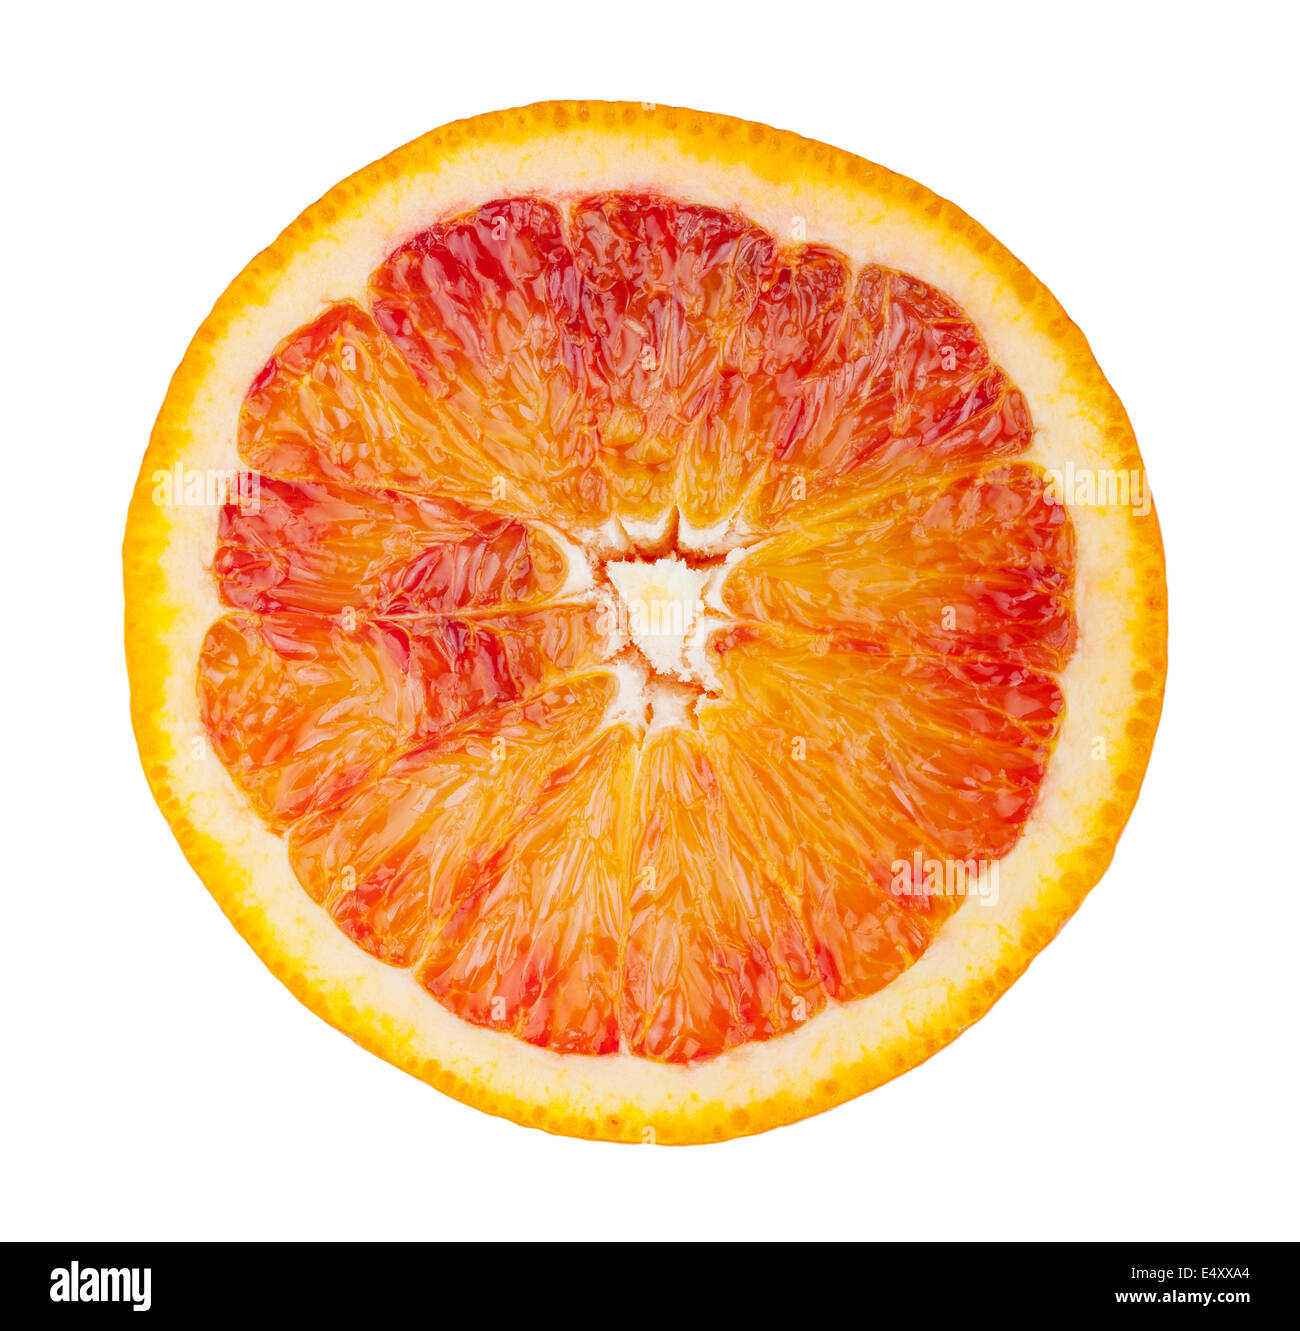 Slice of blood red ripe orange - Stock Image